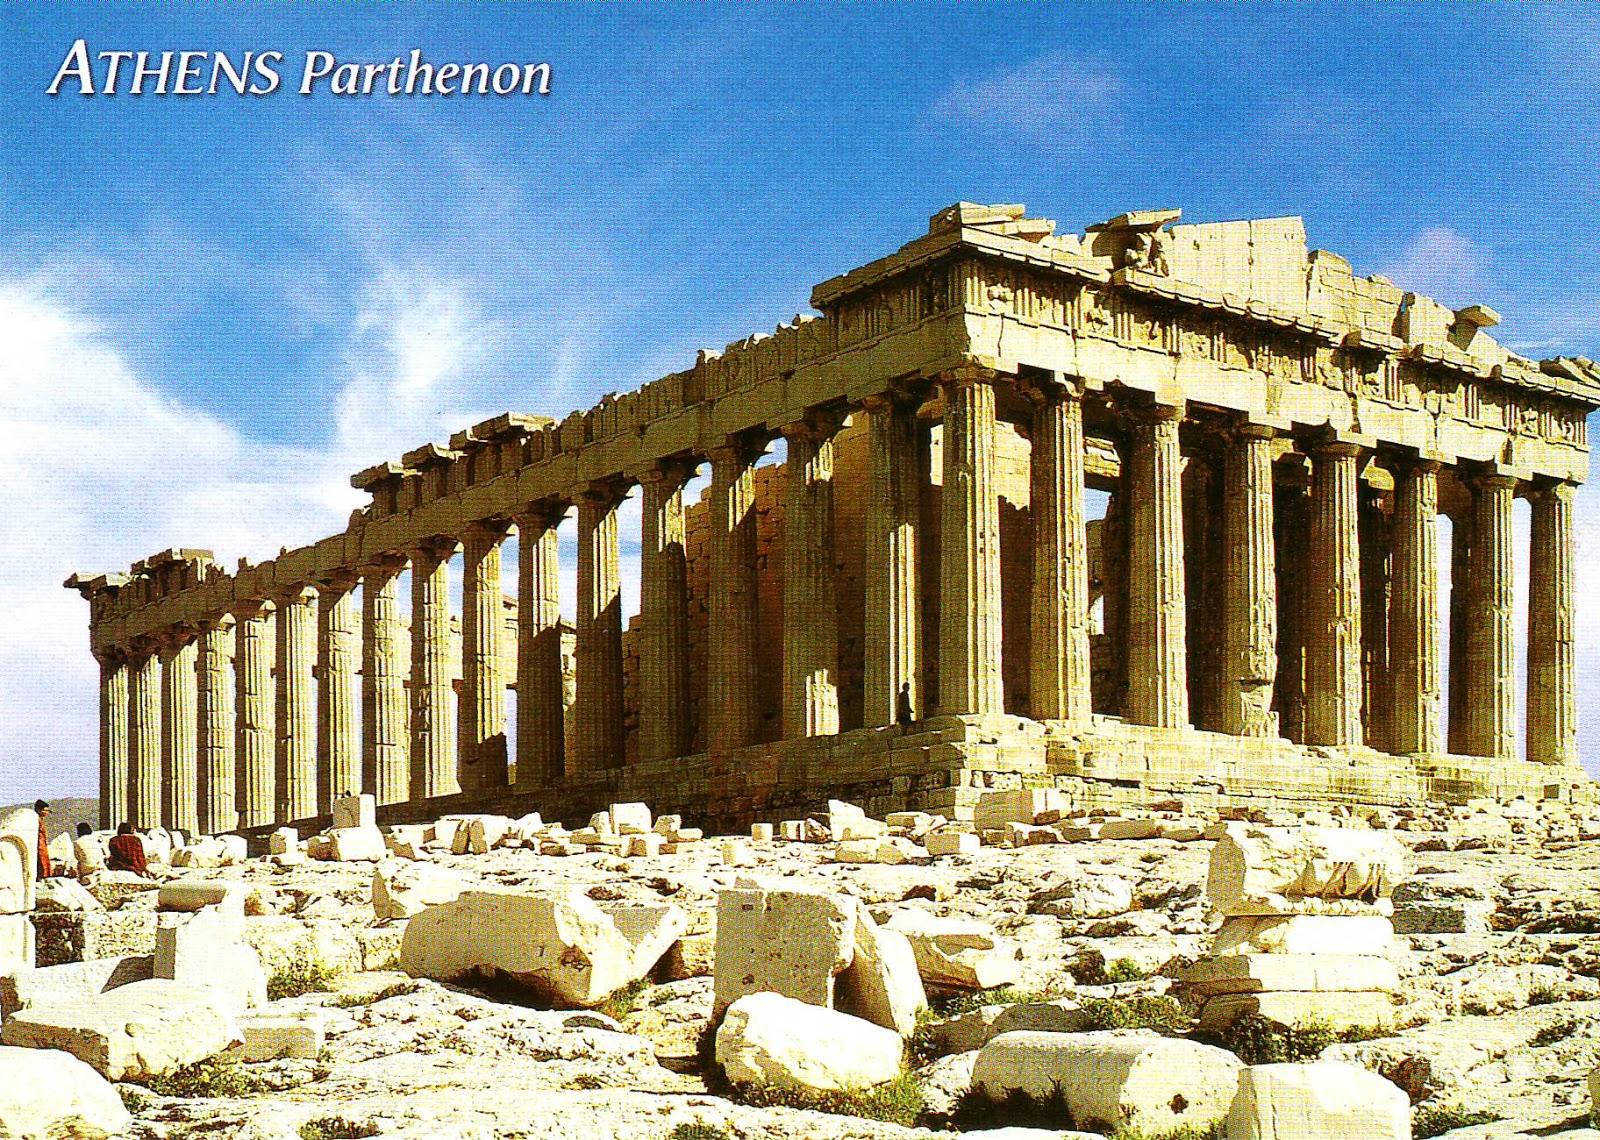 Moonlights UNESCO WHS Blog: Greece - Acropolis, Athens